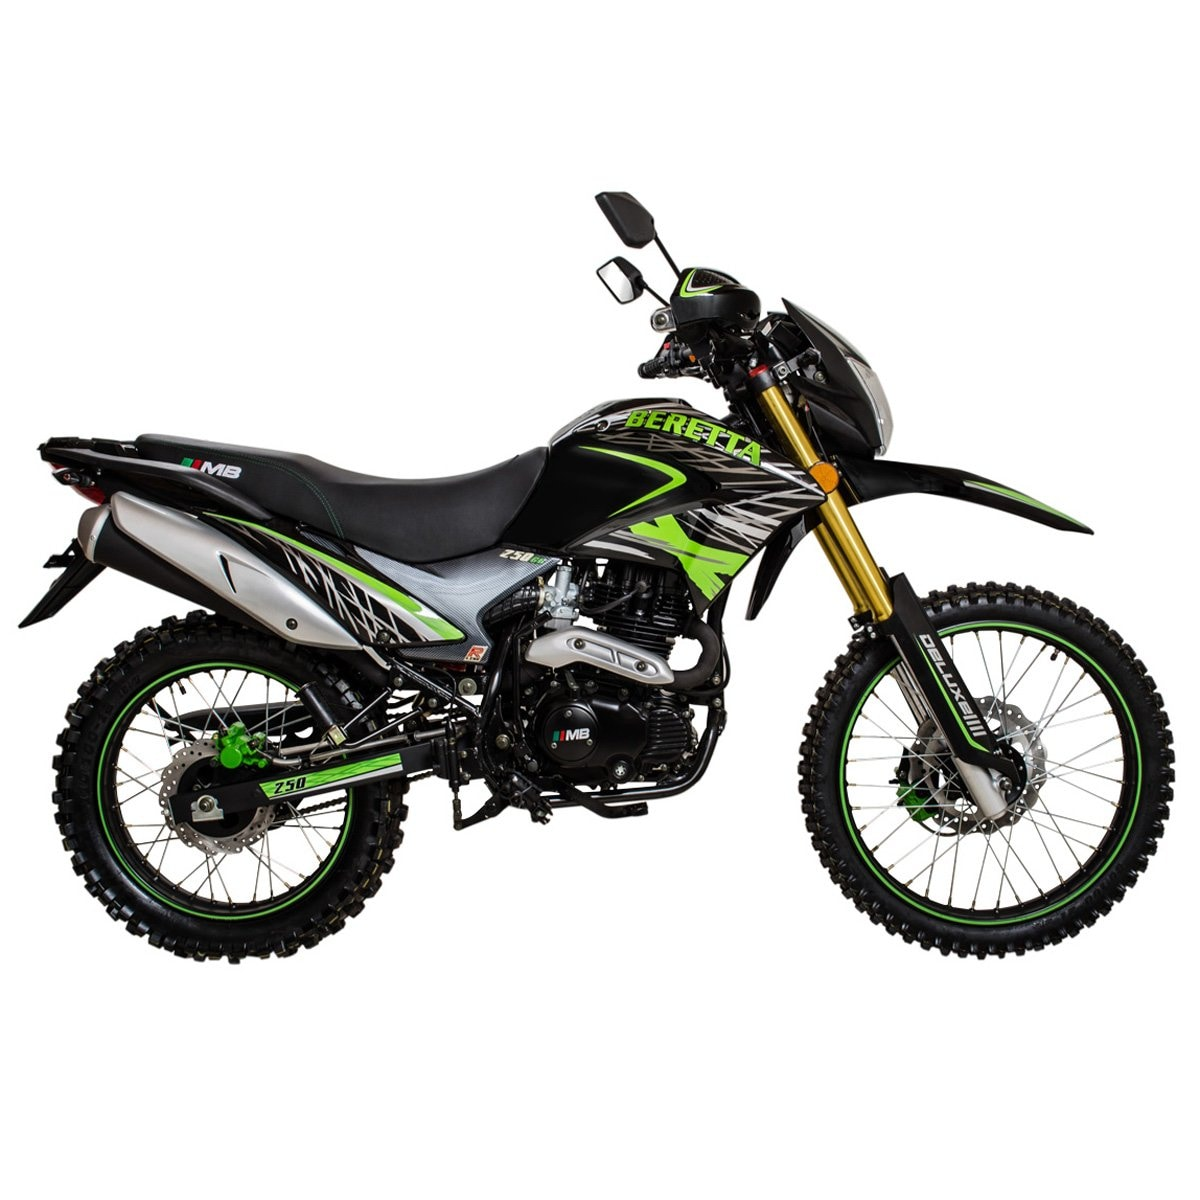 Motocicleta Mb Doblepro Beretta Beretta Motocicleta 250cc roQxEdBCeW